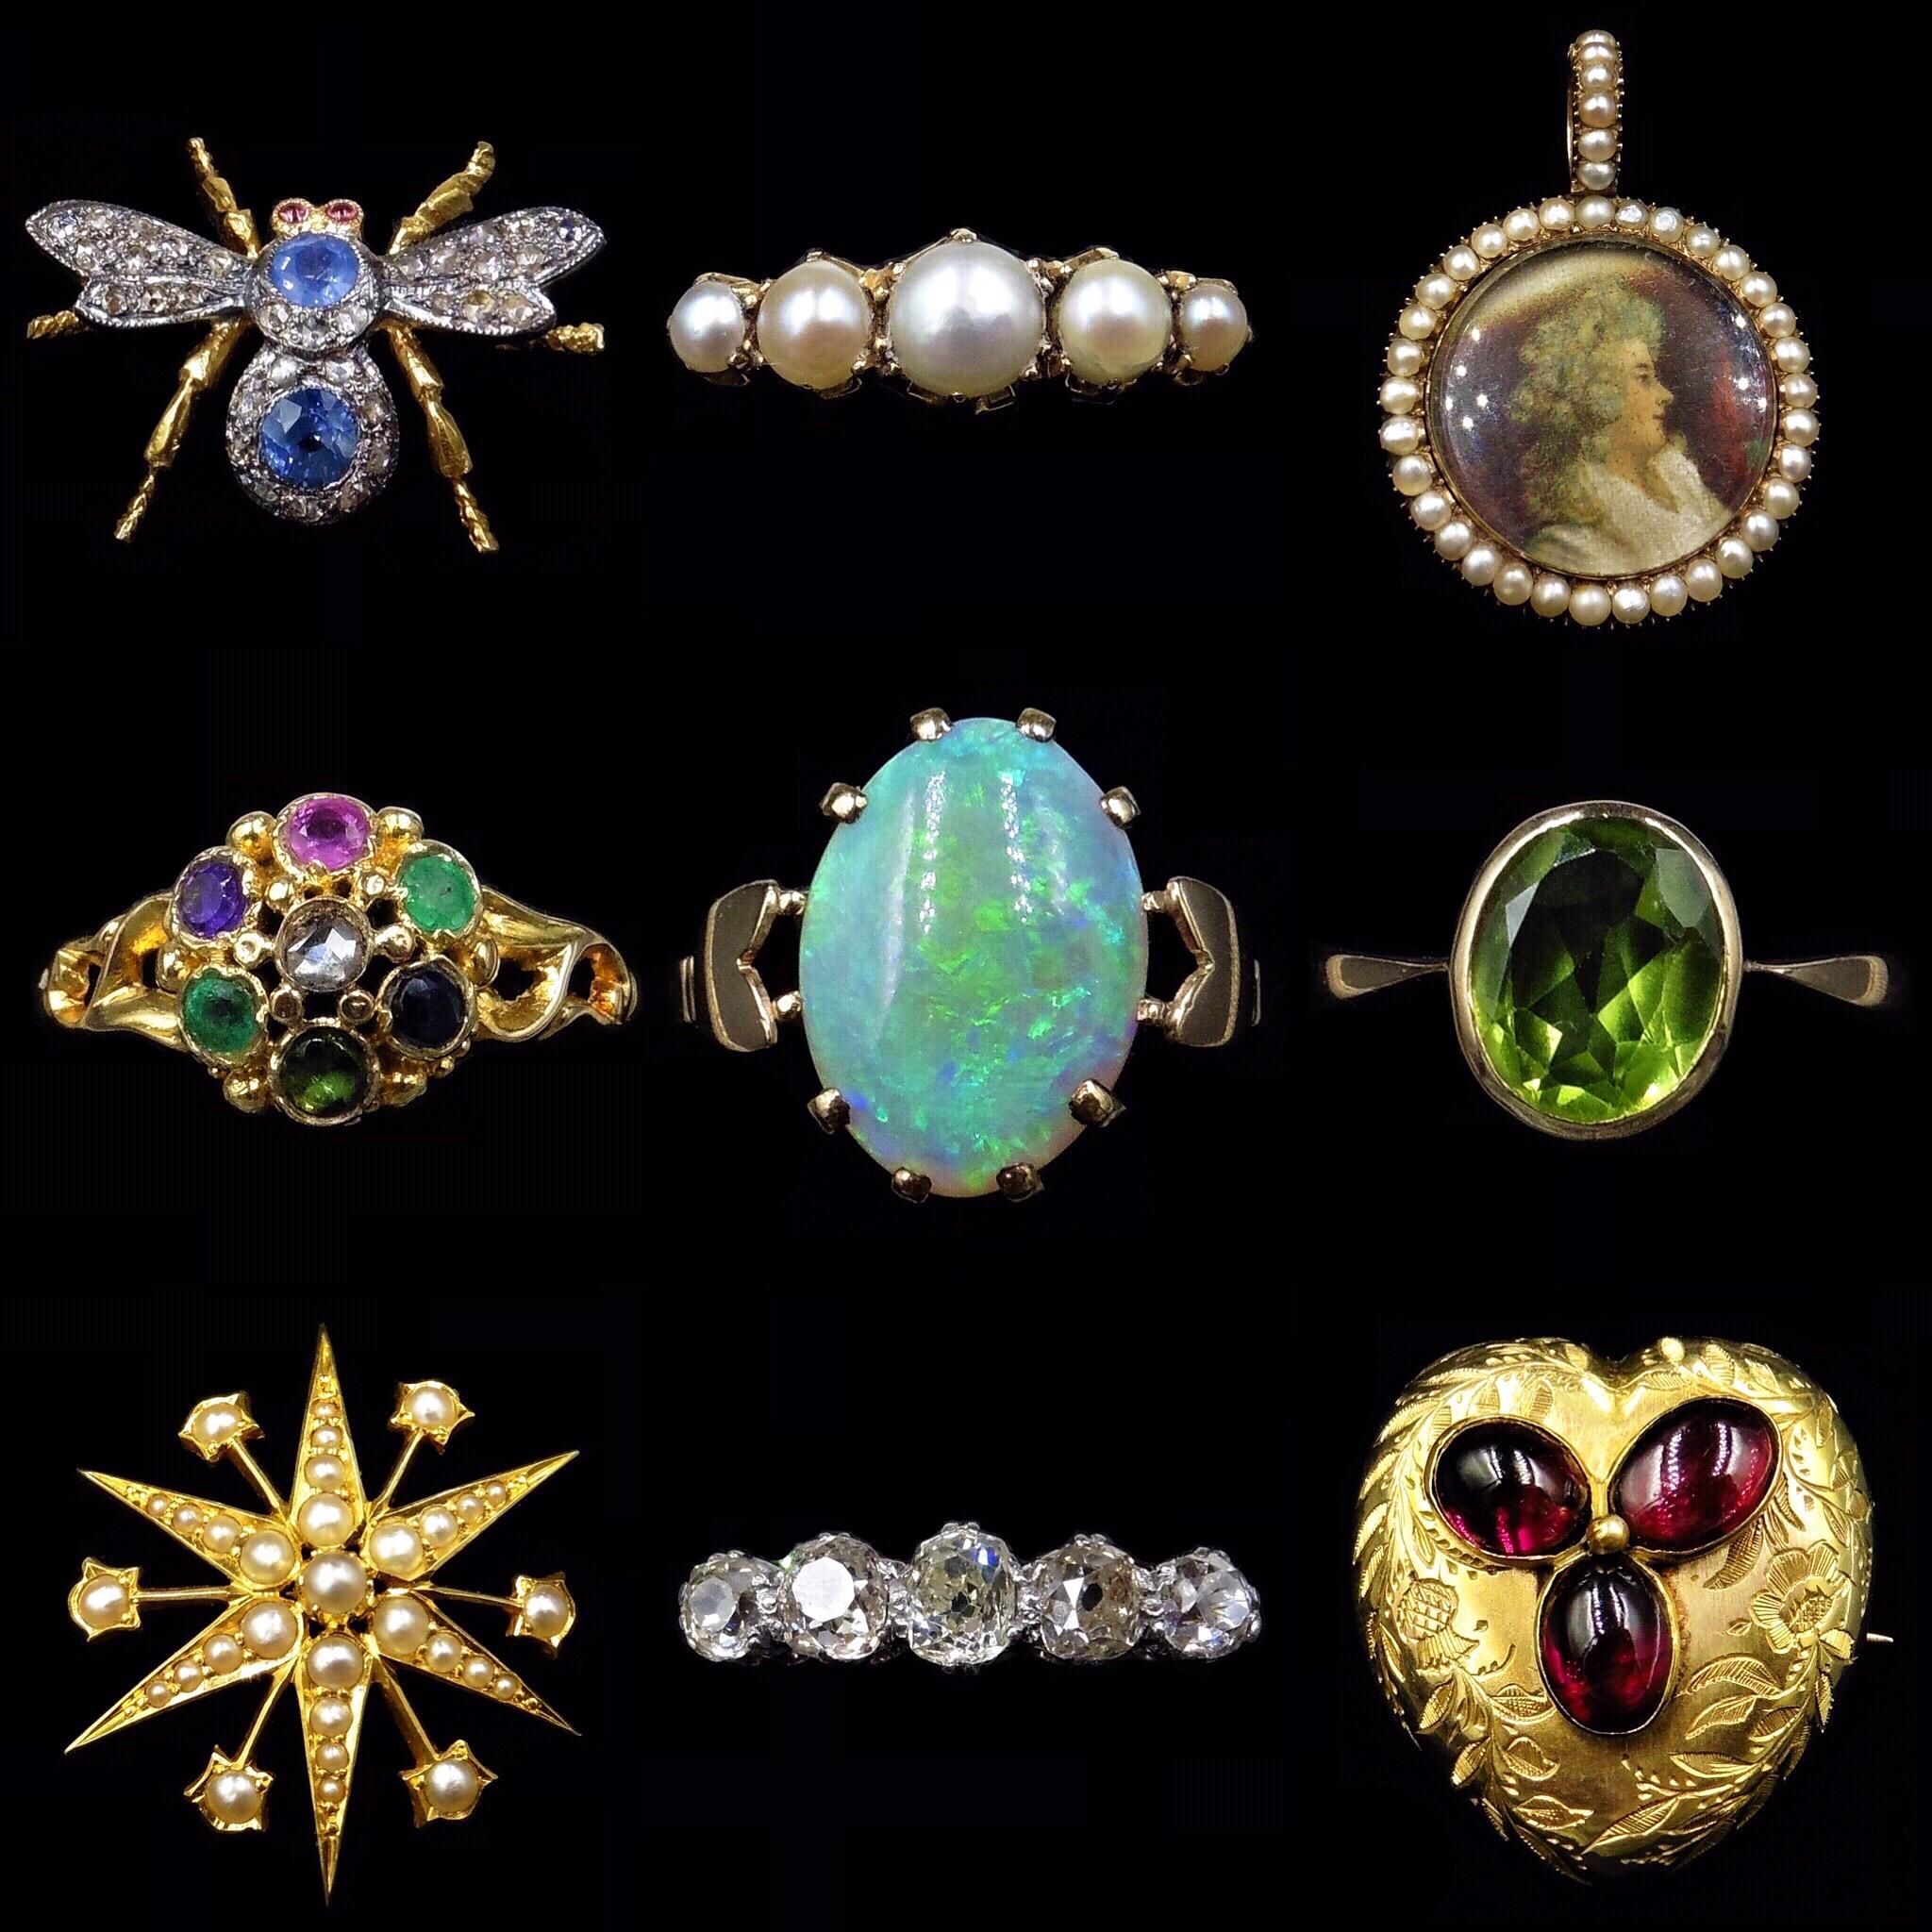 Lancastrian Jewellers image (5 of 6)